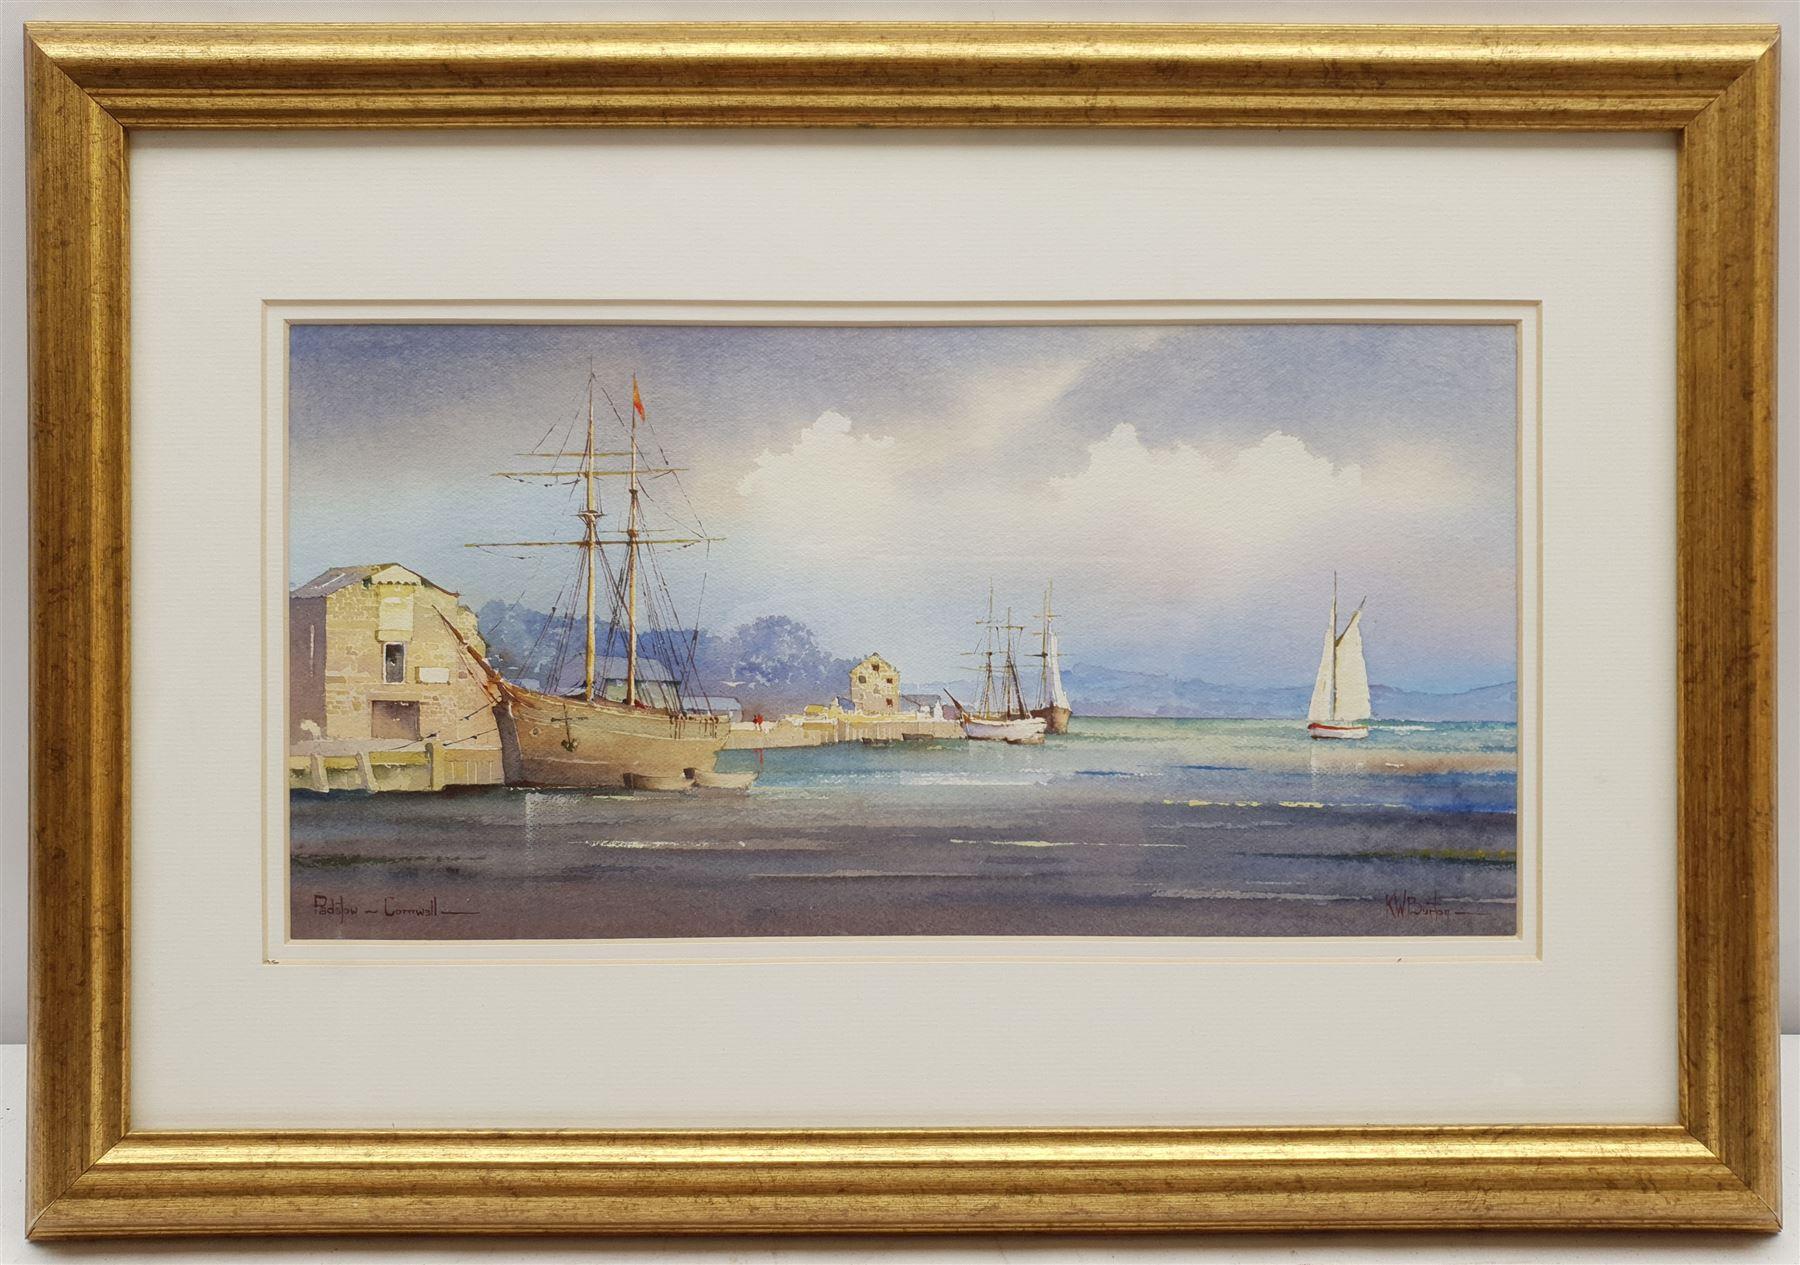 Kenneth W Burton (British 1946-): 'Padstow Cornwall' - Image 2 of 3